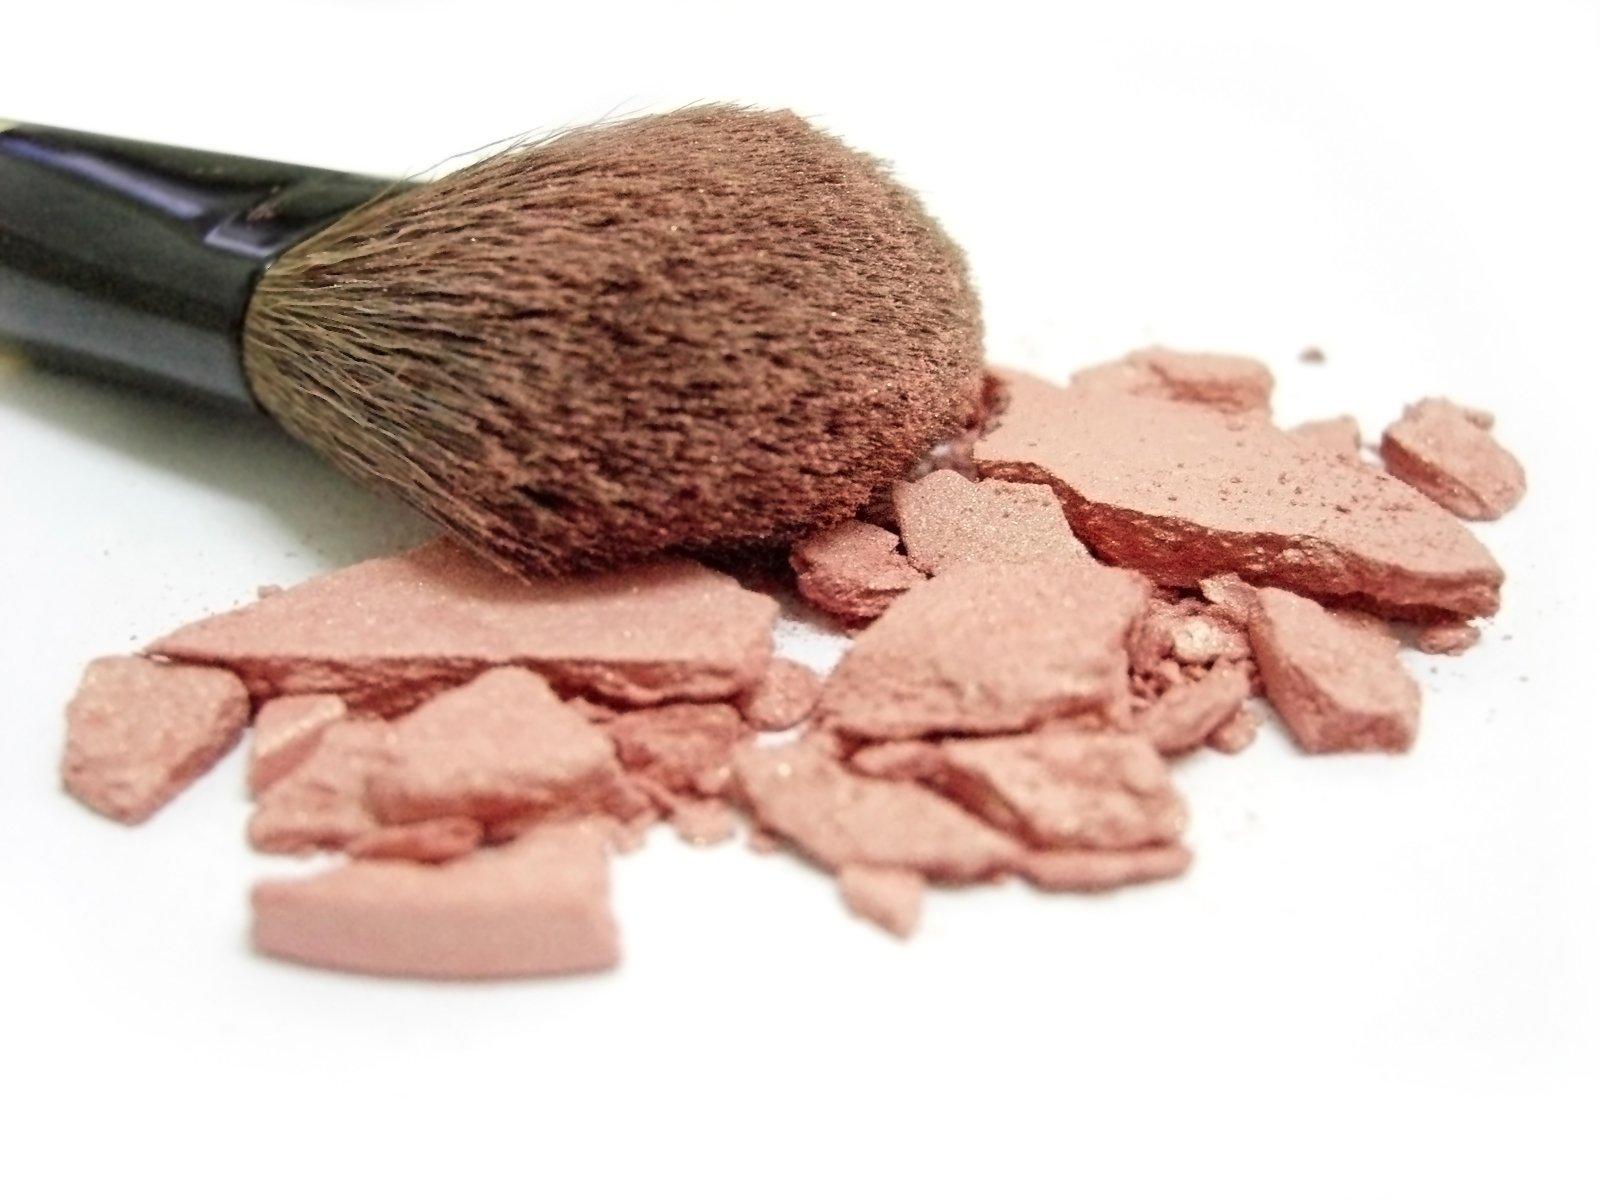 broken-blush-and-makeup-brush-1171197